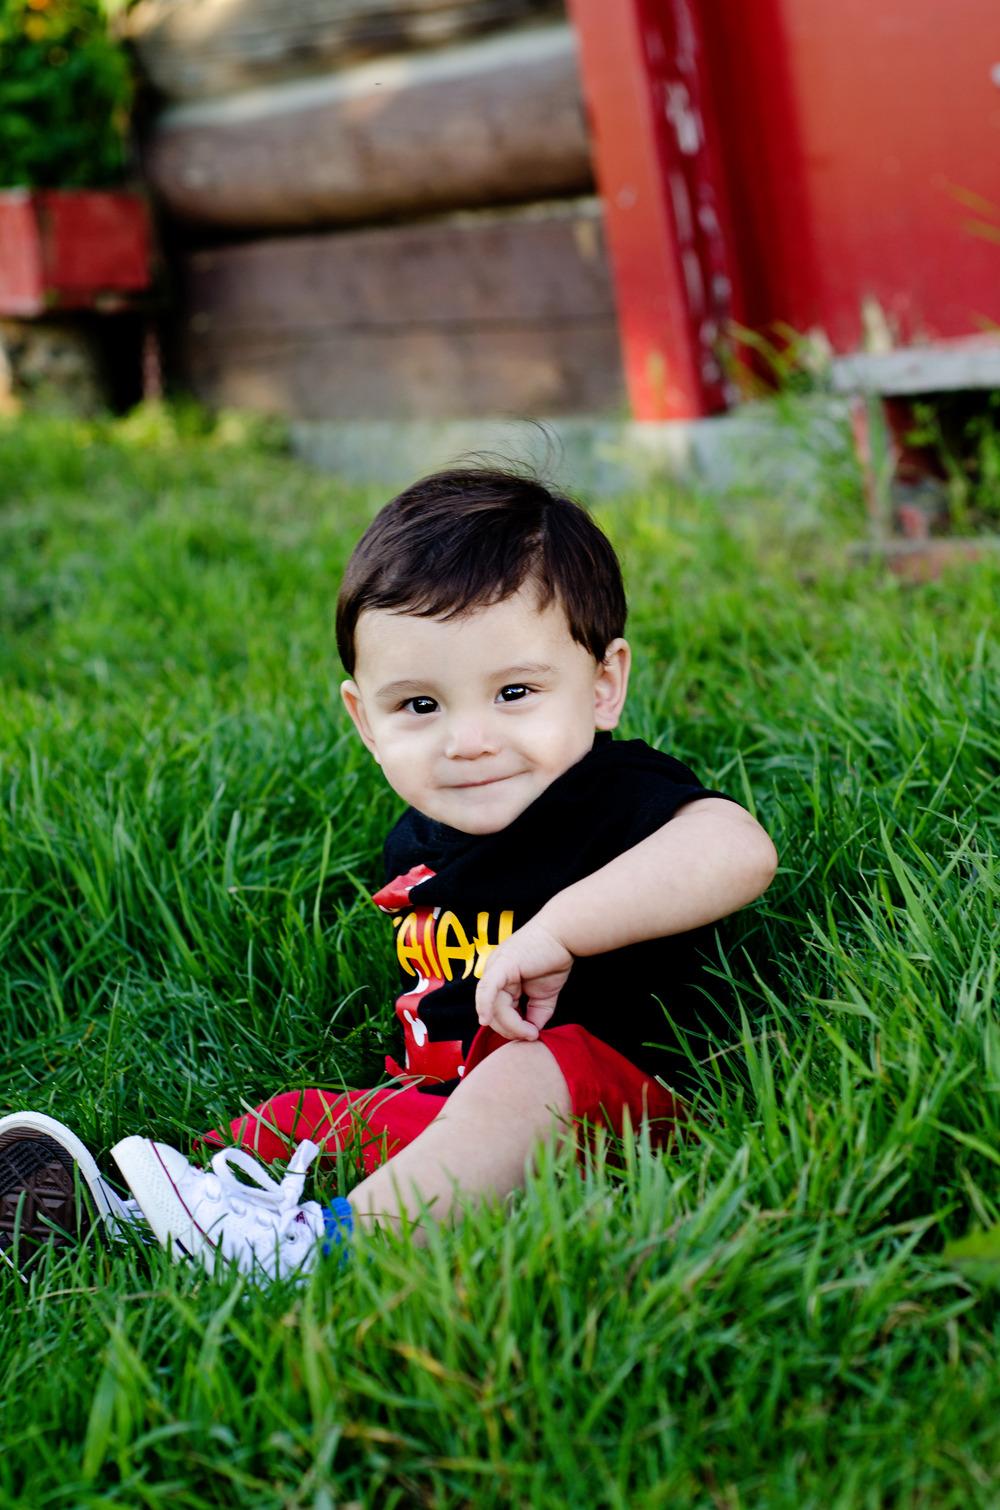 fairbanks alaska children's photographer - baby in grass photos